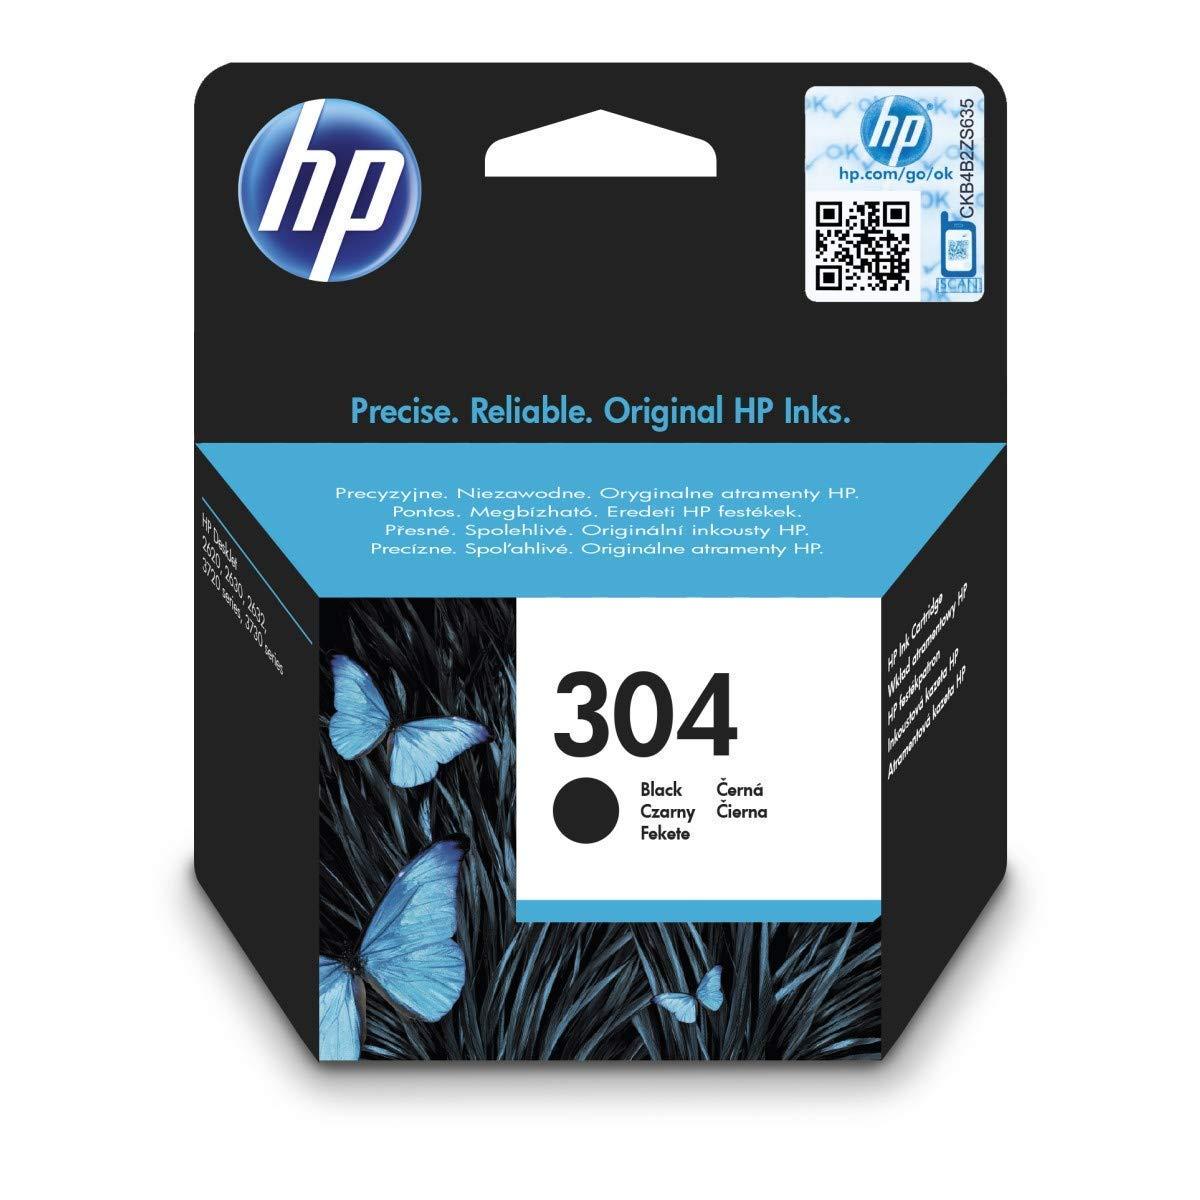 Hewlett Packard 304 - Cartucho de tinta HP adecuado para DJ3720, DJ 2630, DJ 3735, Dj 3733, color negro & AmazonBasics Papel multiusos para impresora ...